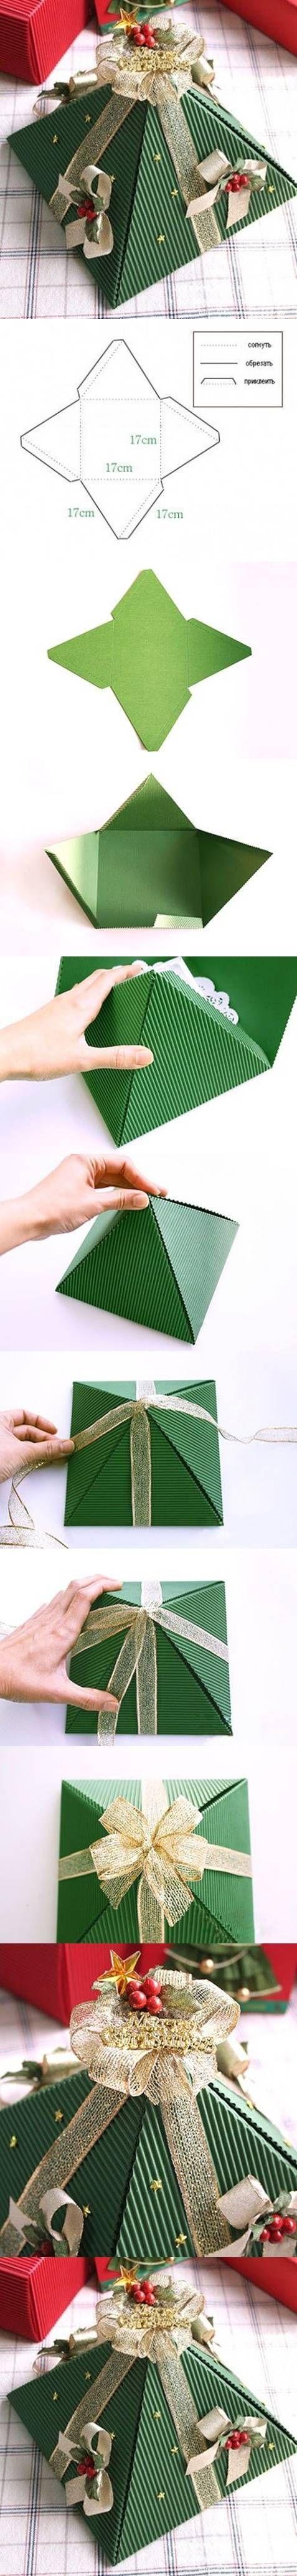 DIY Pyramid Christmas Box: